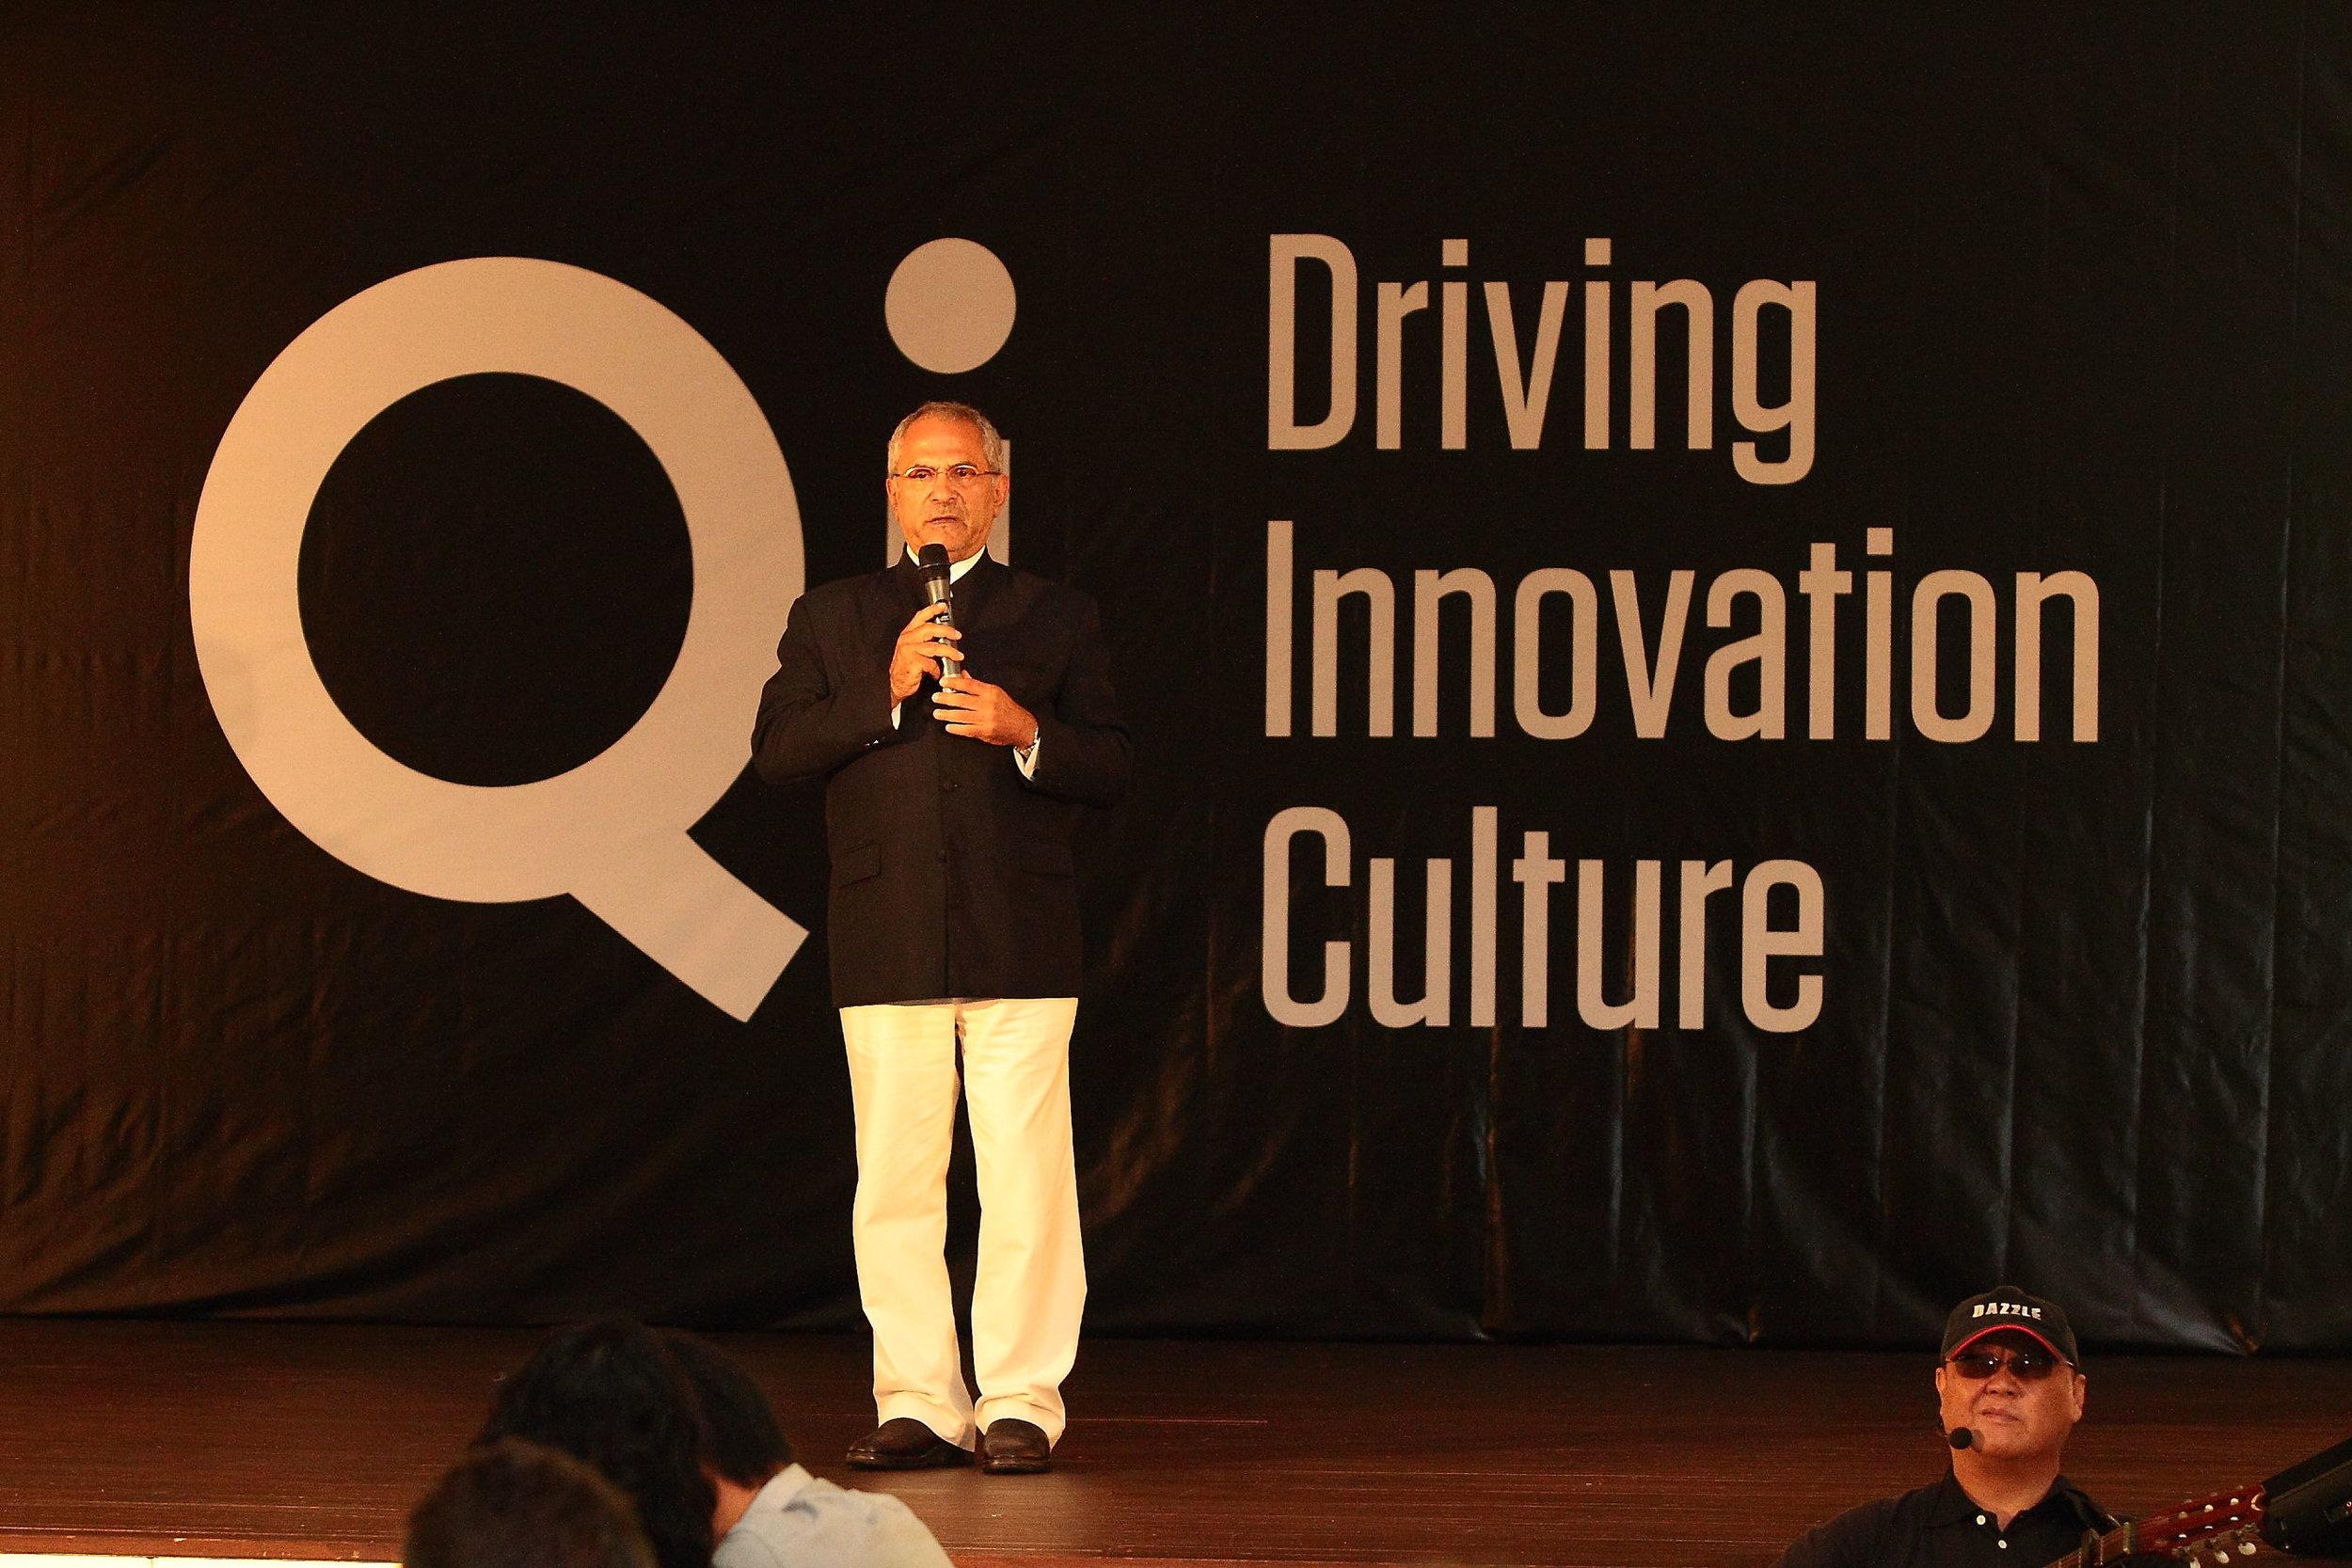 qi-global-2011-driving-innovation-culture-034.jpg